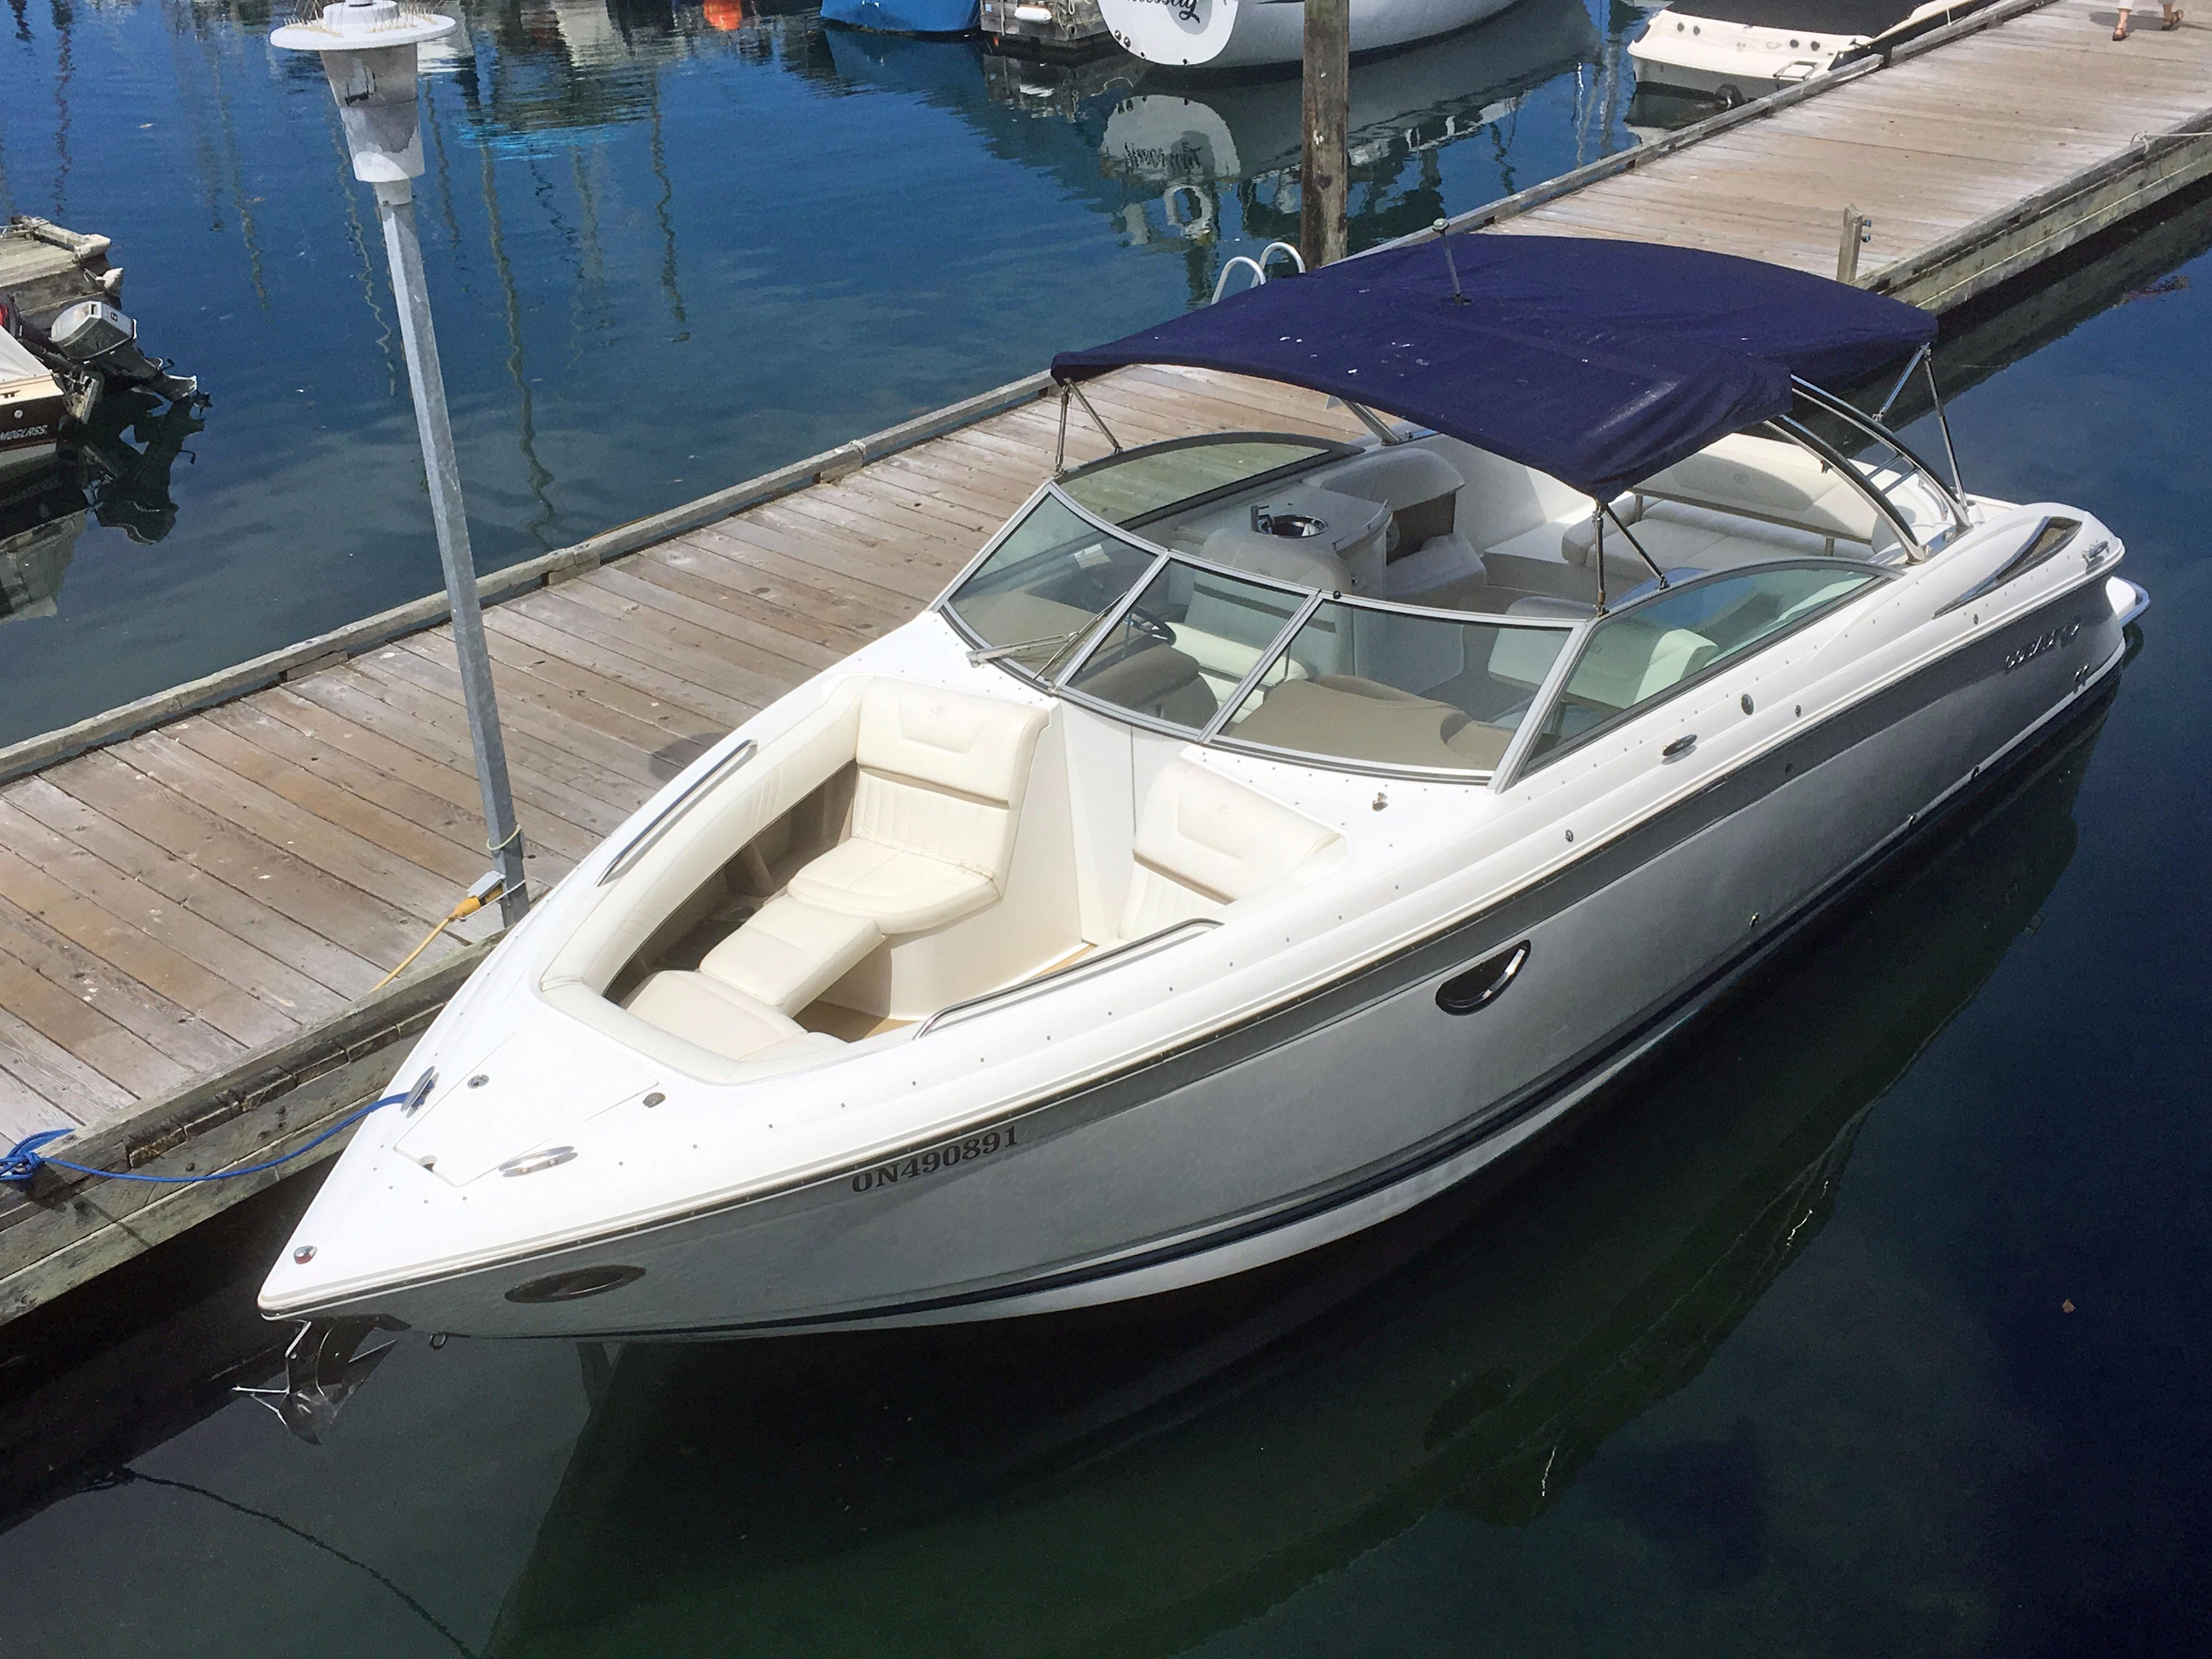 2007 Cobalt 302 Power Boat For Sale Wwwyachtworldcom